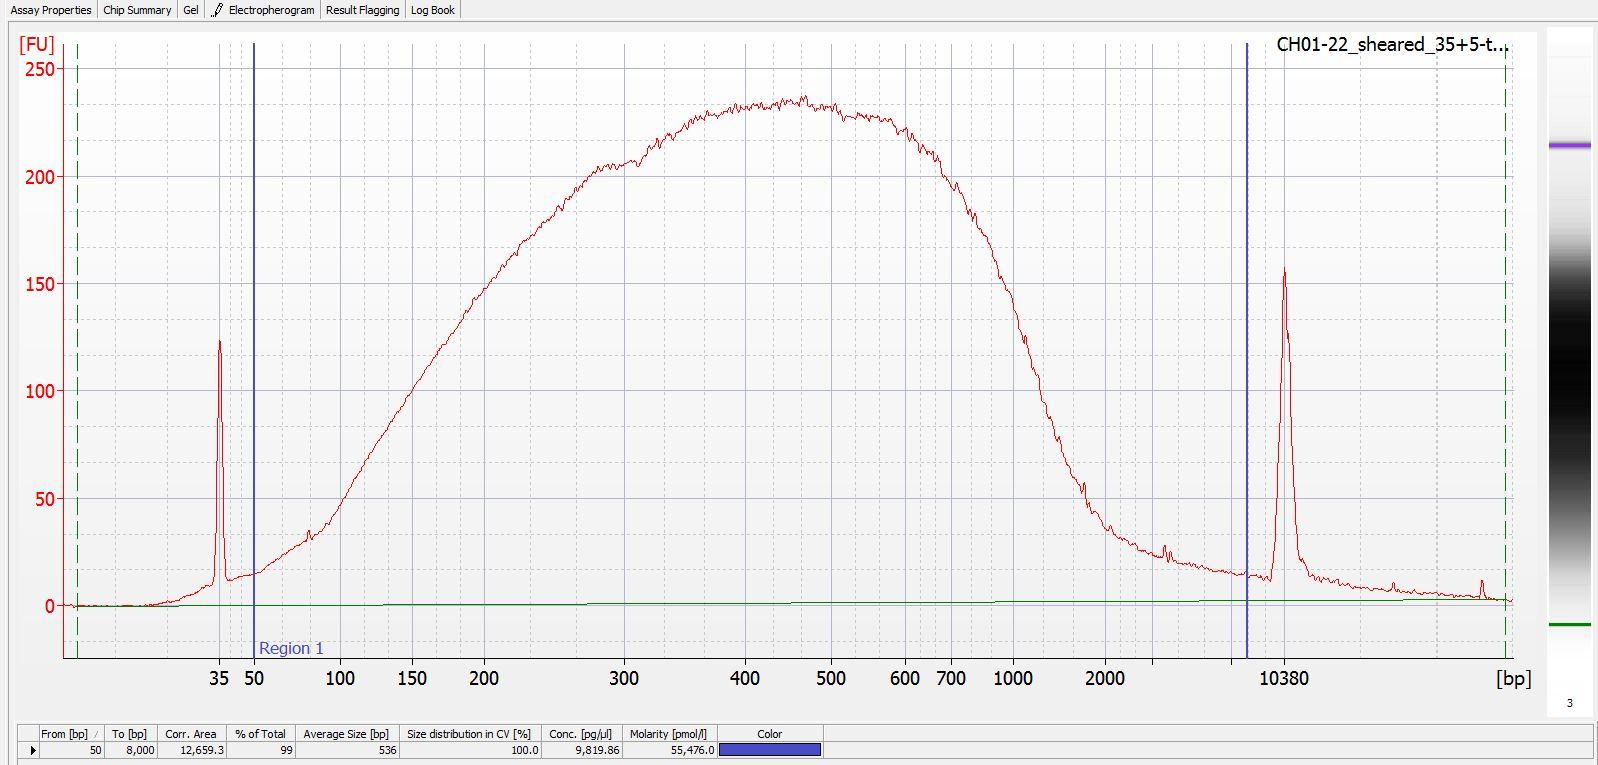 Sheared CH01-22 Bioanalyzer electropherogram